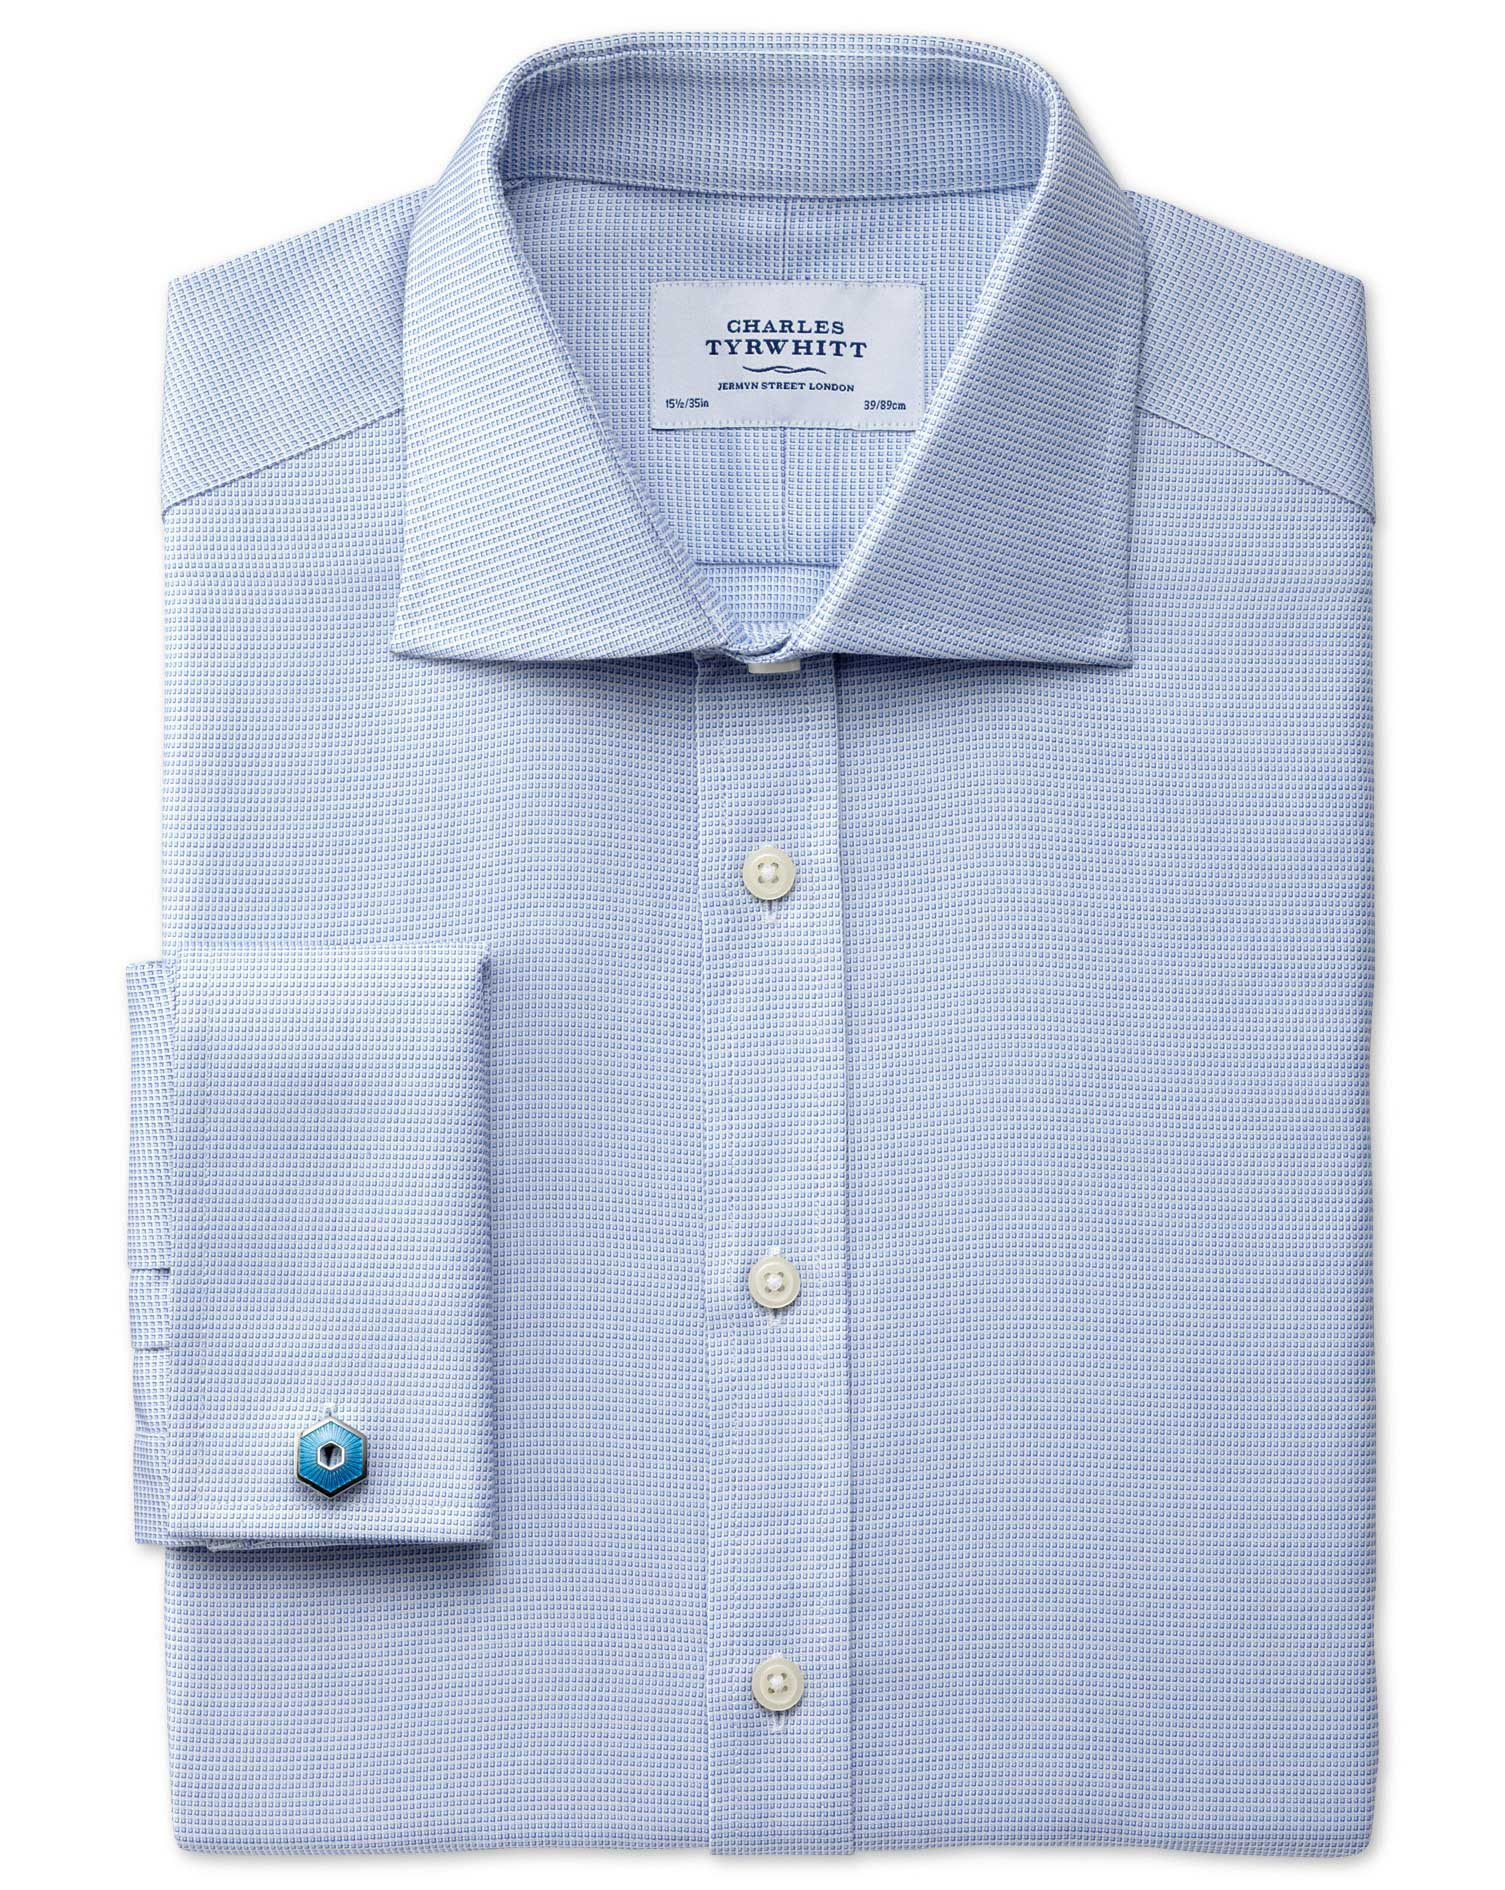 Slim Fit Semi-Cutaway Collar Regency Weave Sky Blue Egyptian Cotton Formal Shirt Double Cuff Size 14